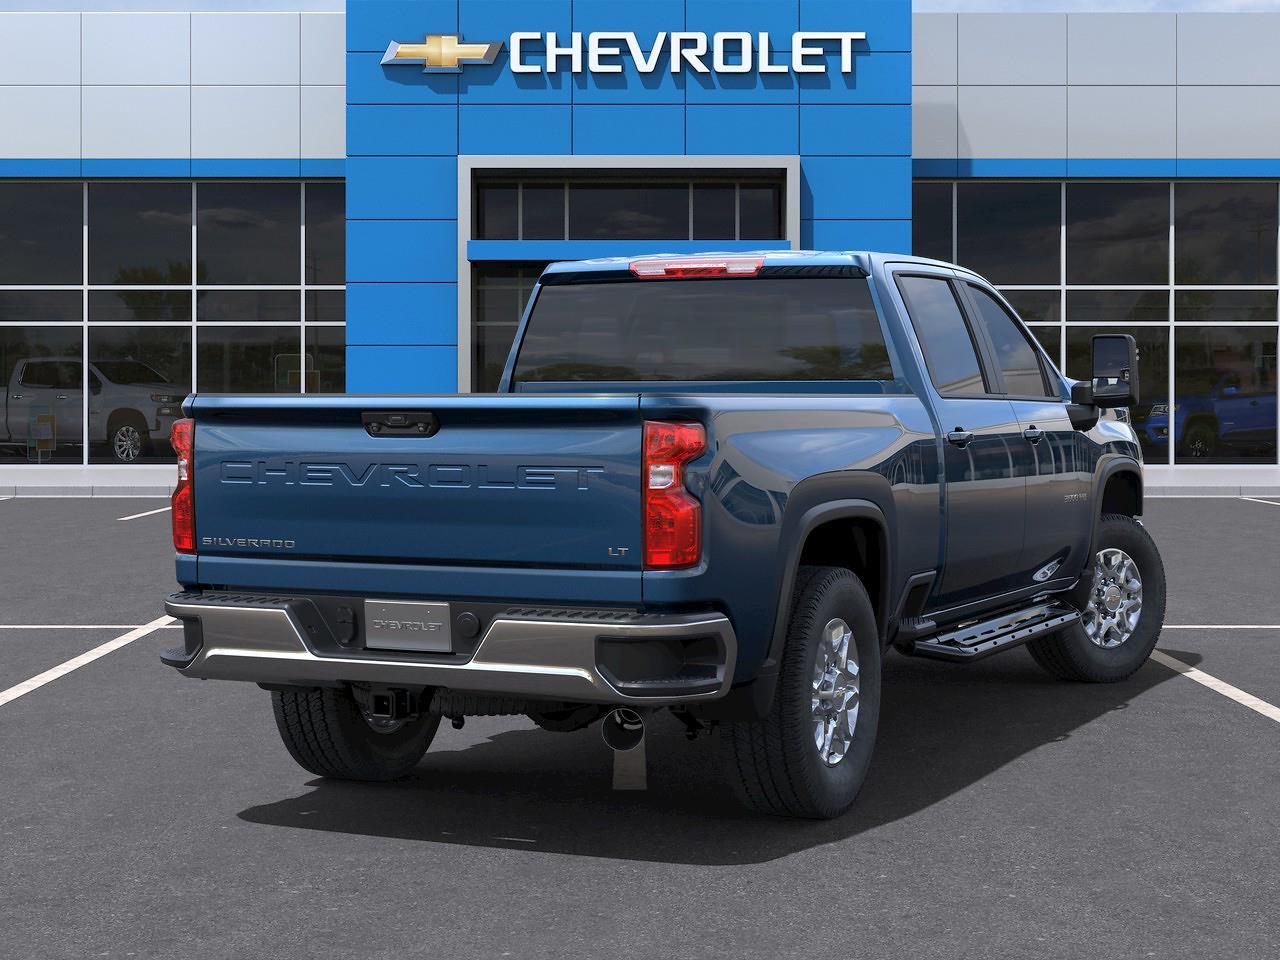 2021 Chevrolet Silverado 3500 Crew Cab 4x4, Pickup #Q210427 - photo 2